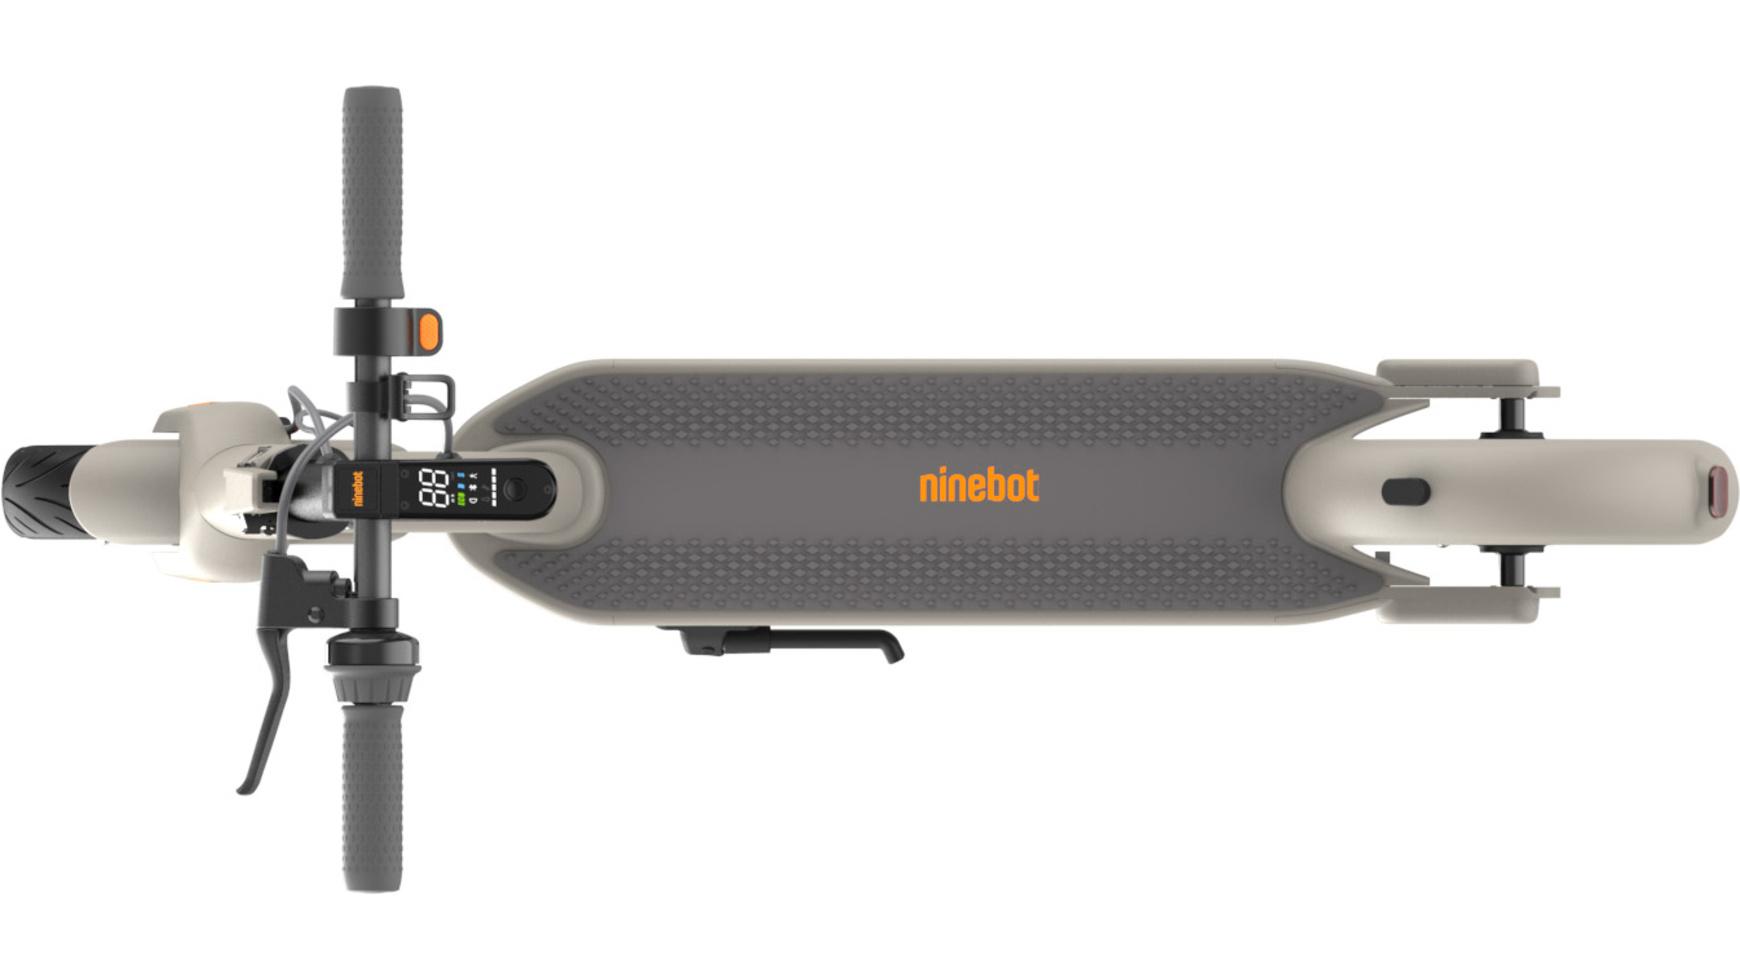 Trittbrett des eScooters Segway Ninebot G30LD